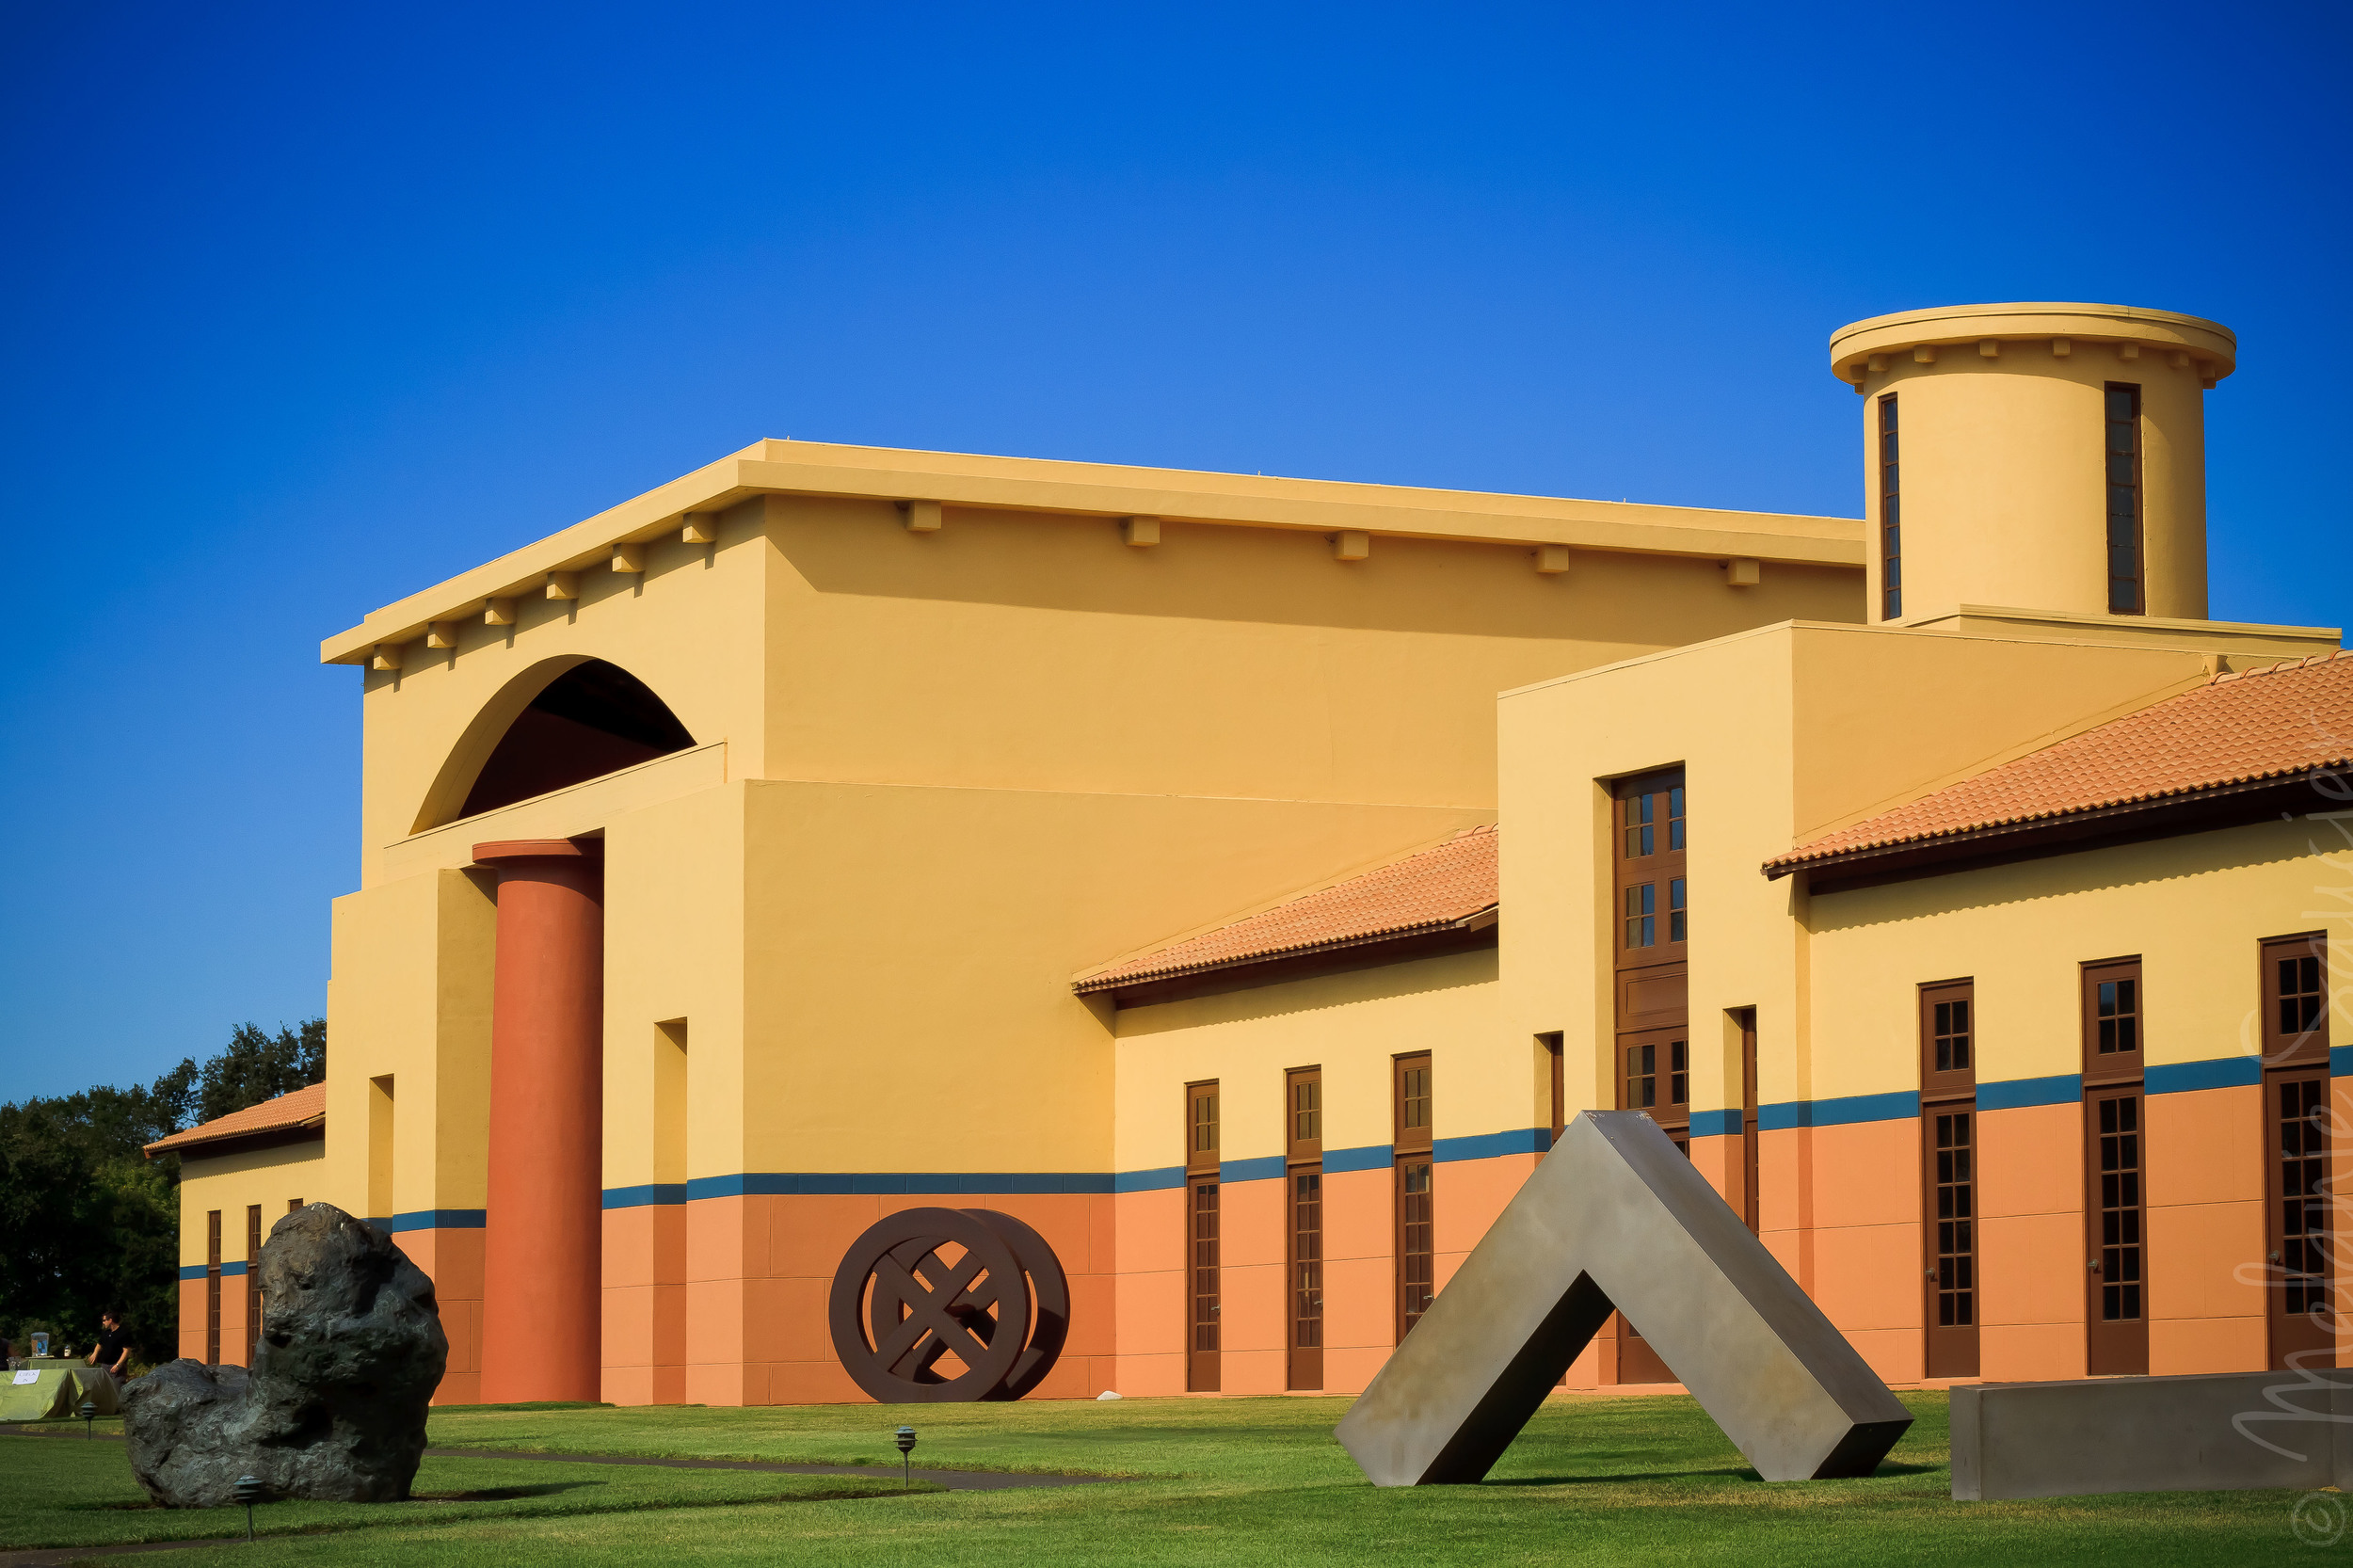 Winery Clos Pegase California Napa (4)